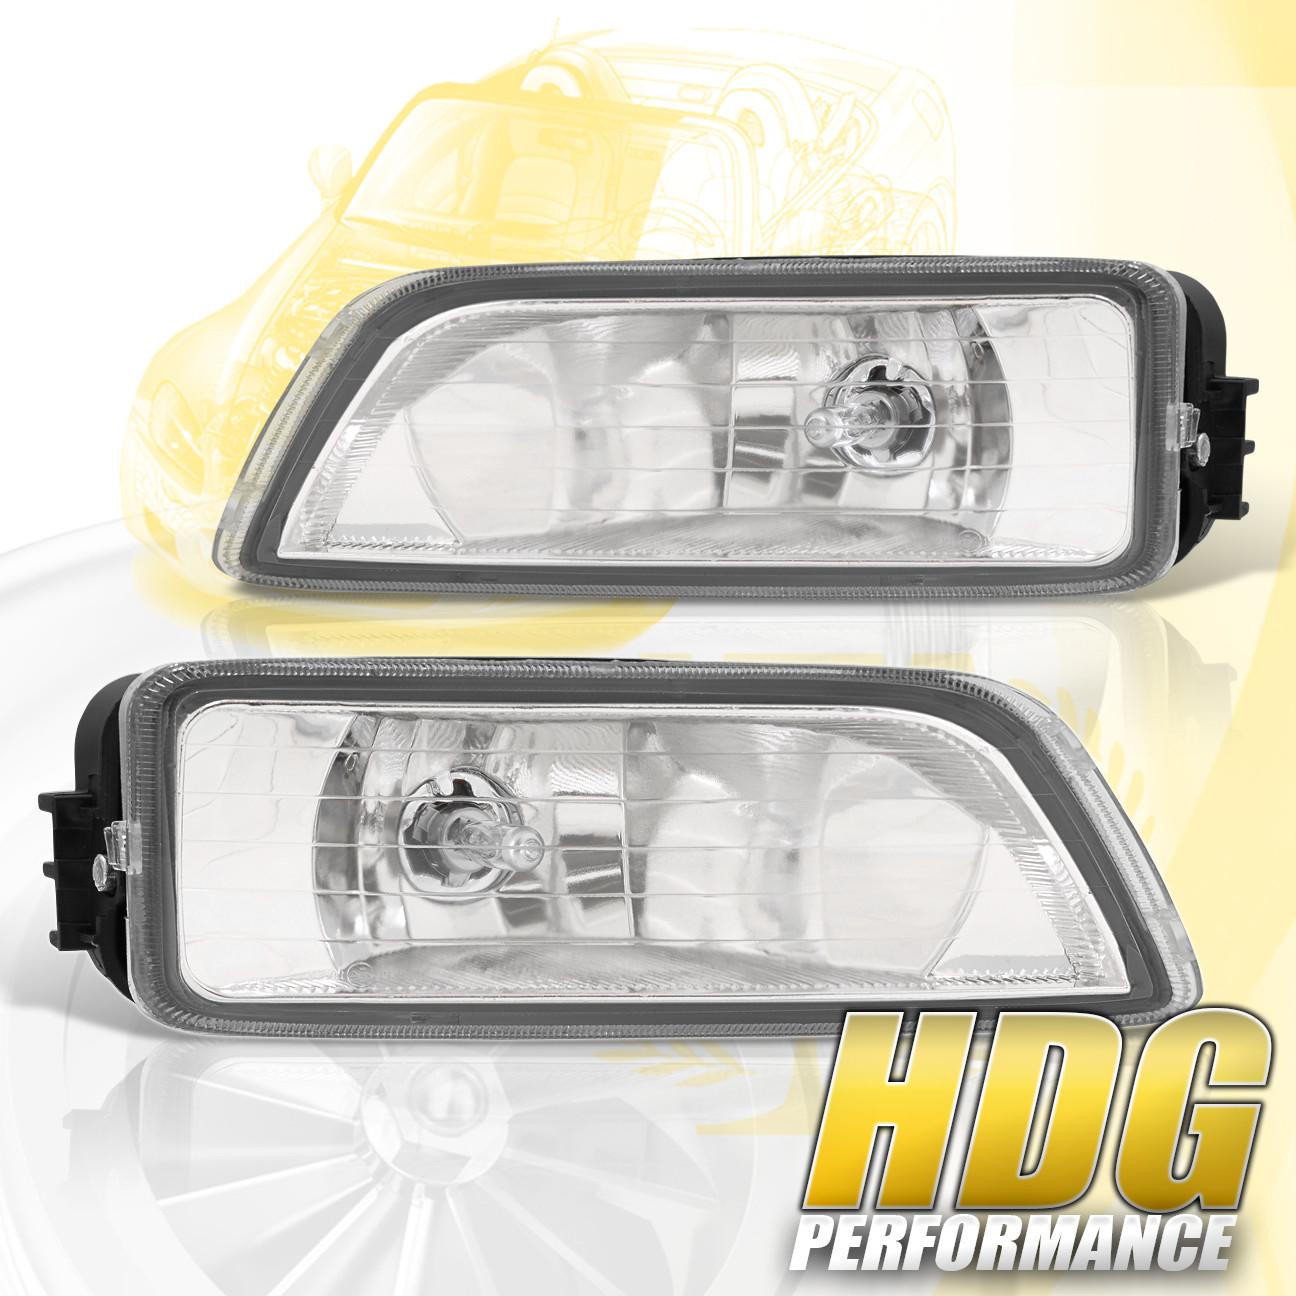 For 2004-2008 Acura TL / 2003-2007 Honda Accord Clear Fog Lights w/ Wiring  Kit